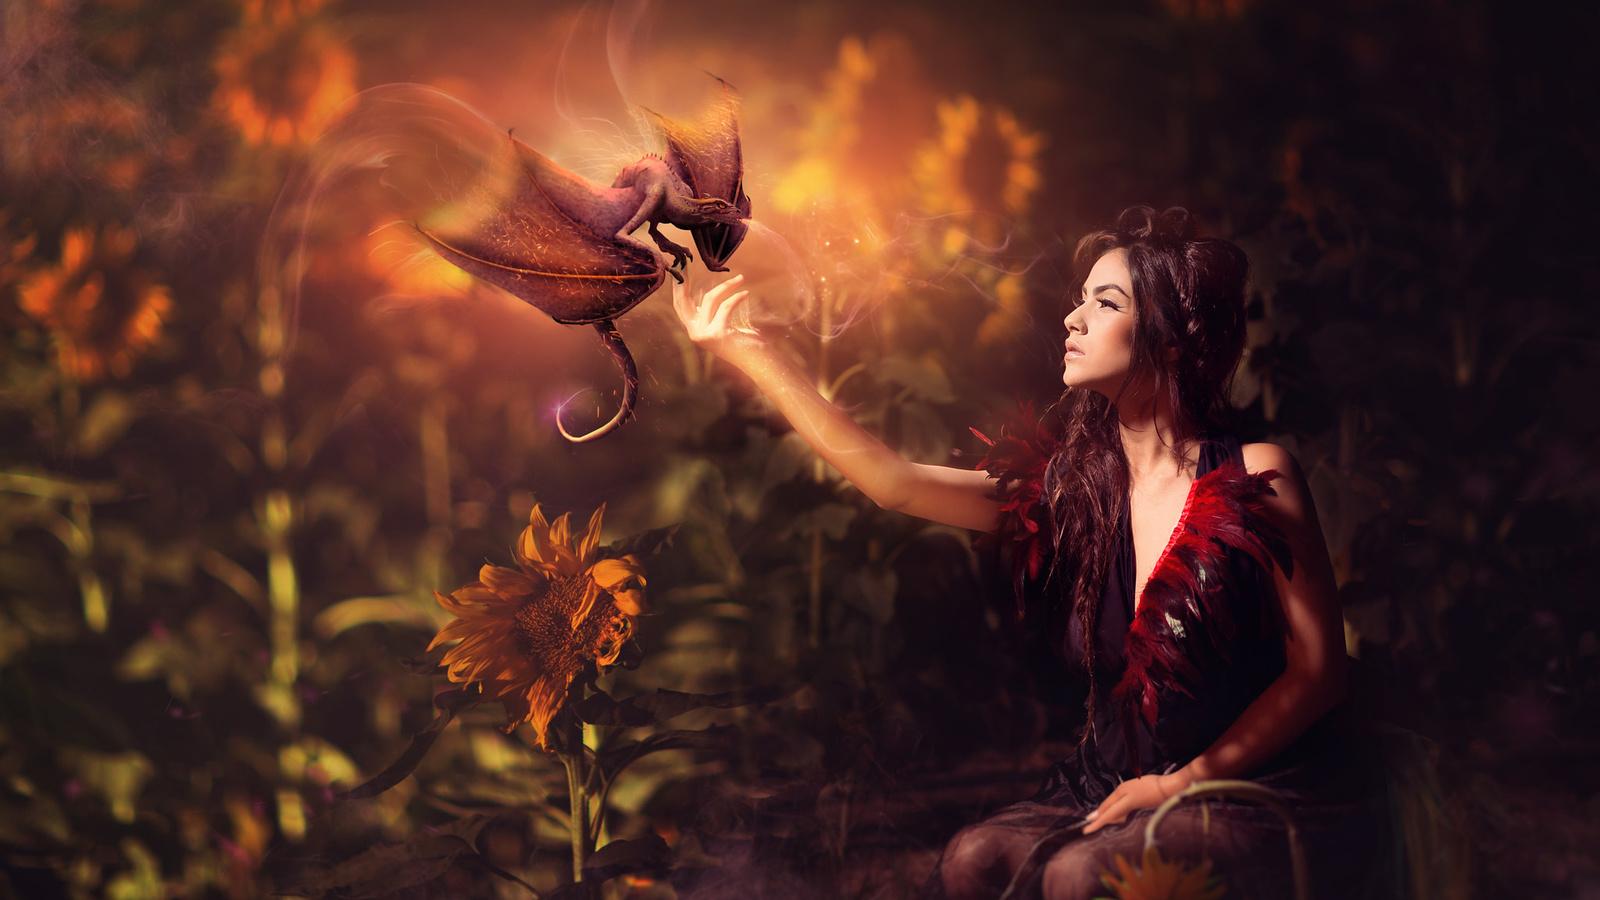 evgeny loza, девушка, брюнетка, дракон, фэнтези, подсолнухи